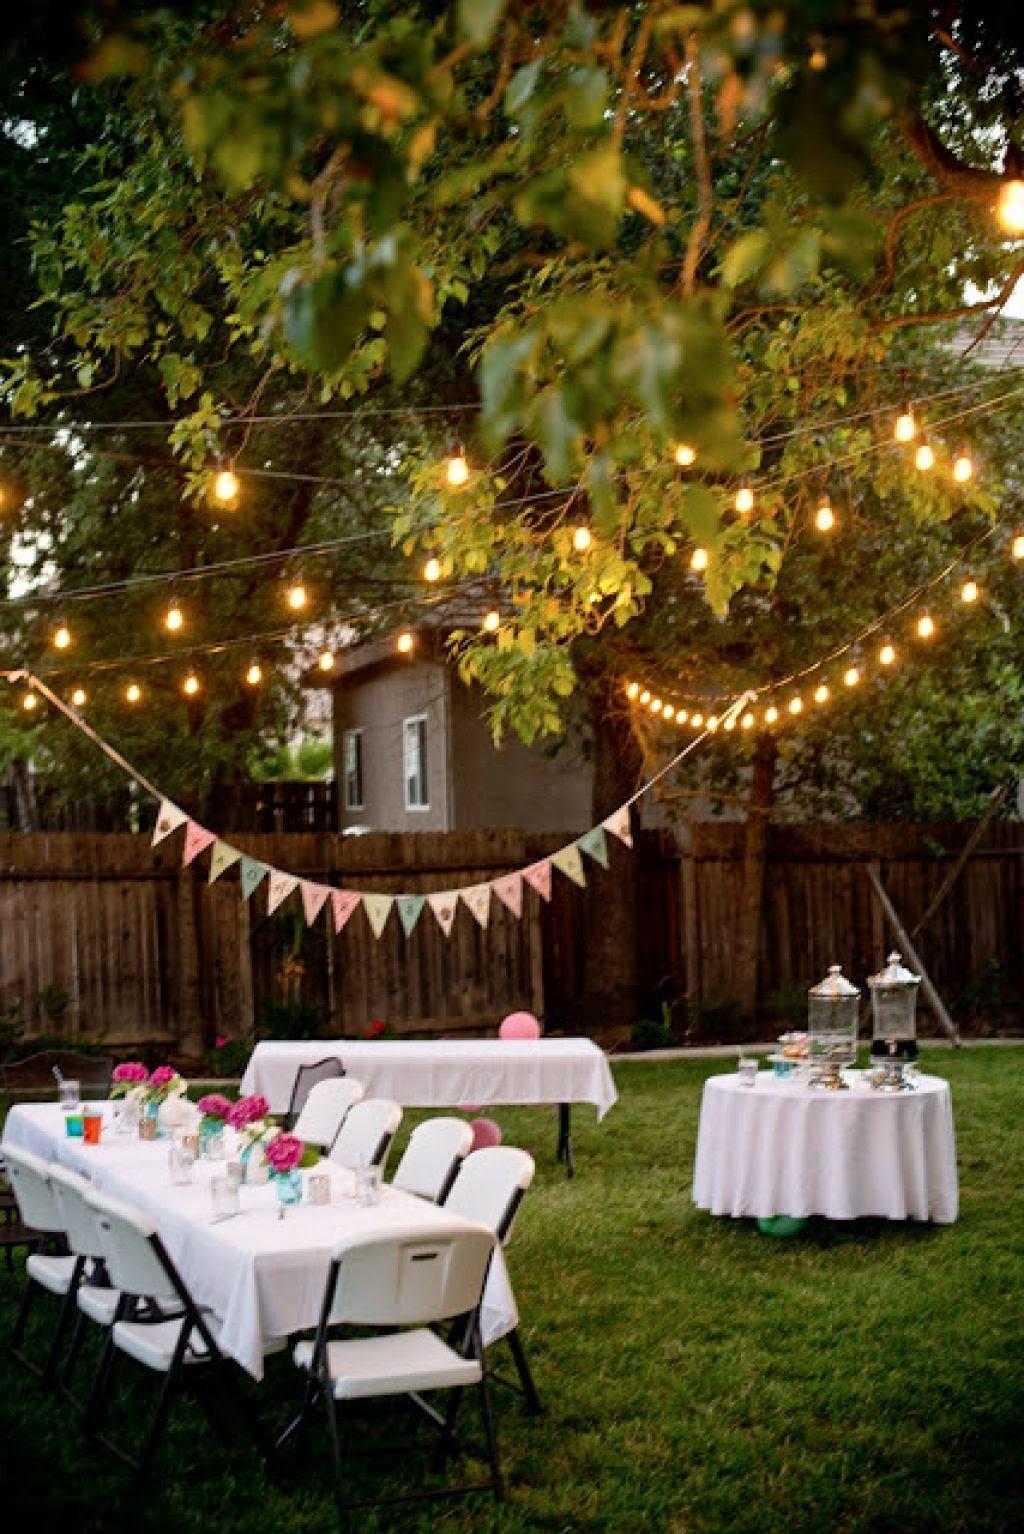 Enjoy a year-end party in the backyard on Backyard Decor  id=70756